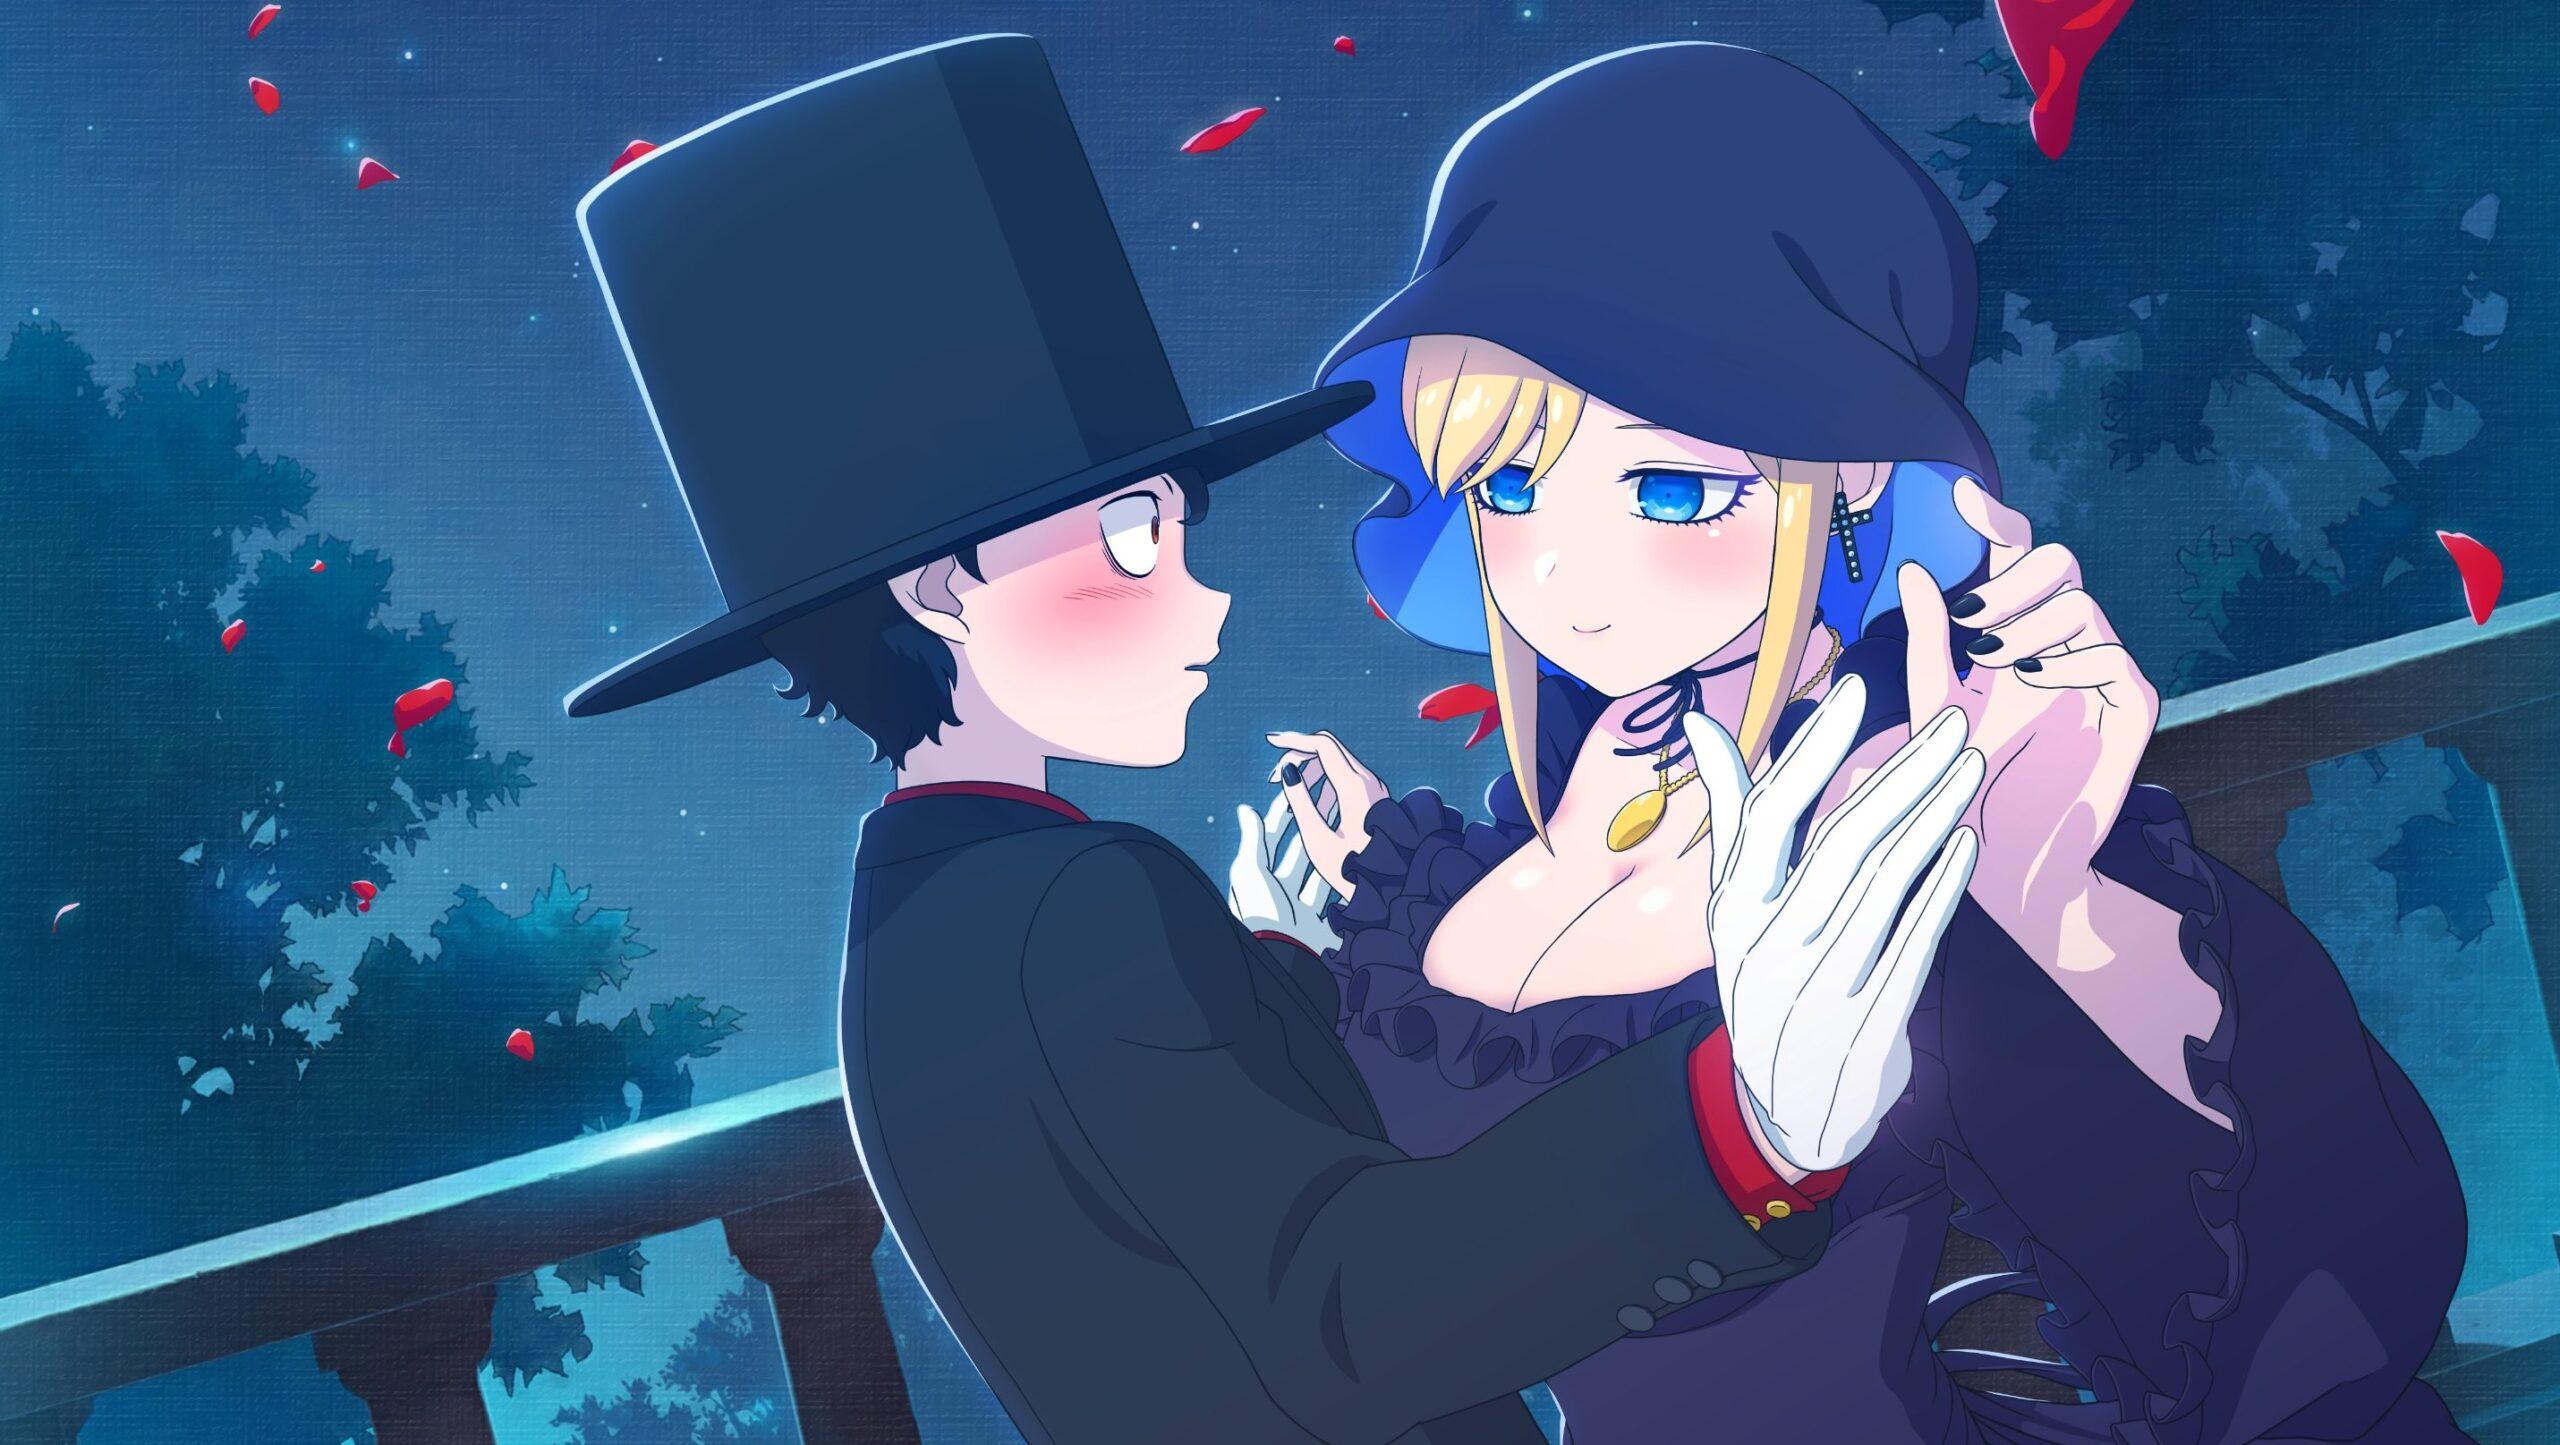 Mangá 'Shinigami Bocchan to Kuro Maid' tem anime anunciado